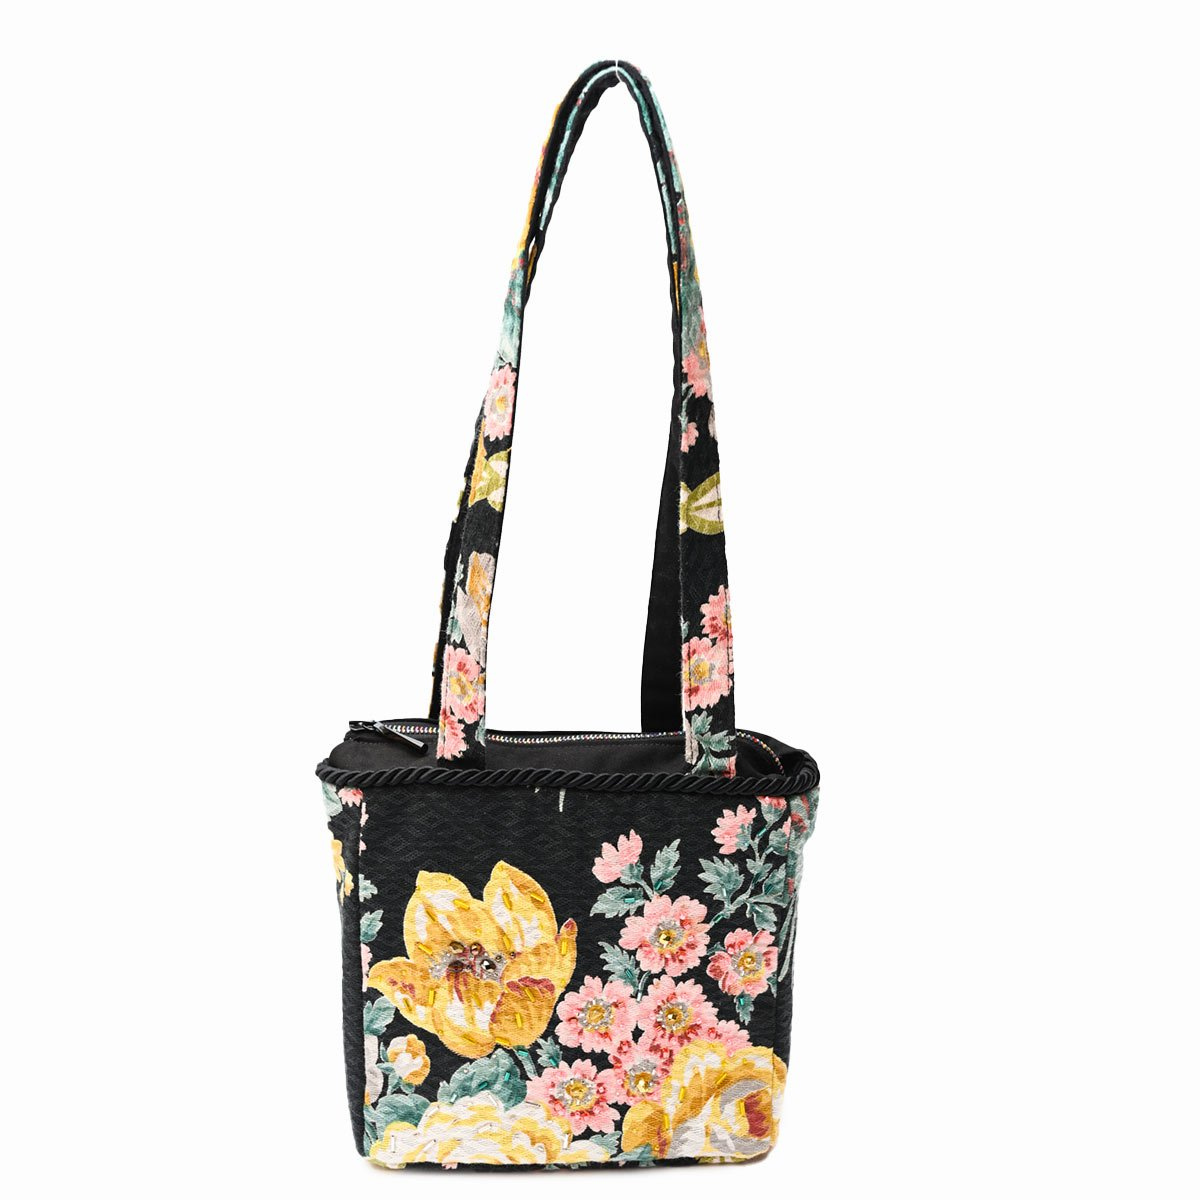 Medium Square Hand-Beaded Bag – Floral Motif on Black